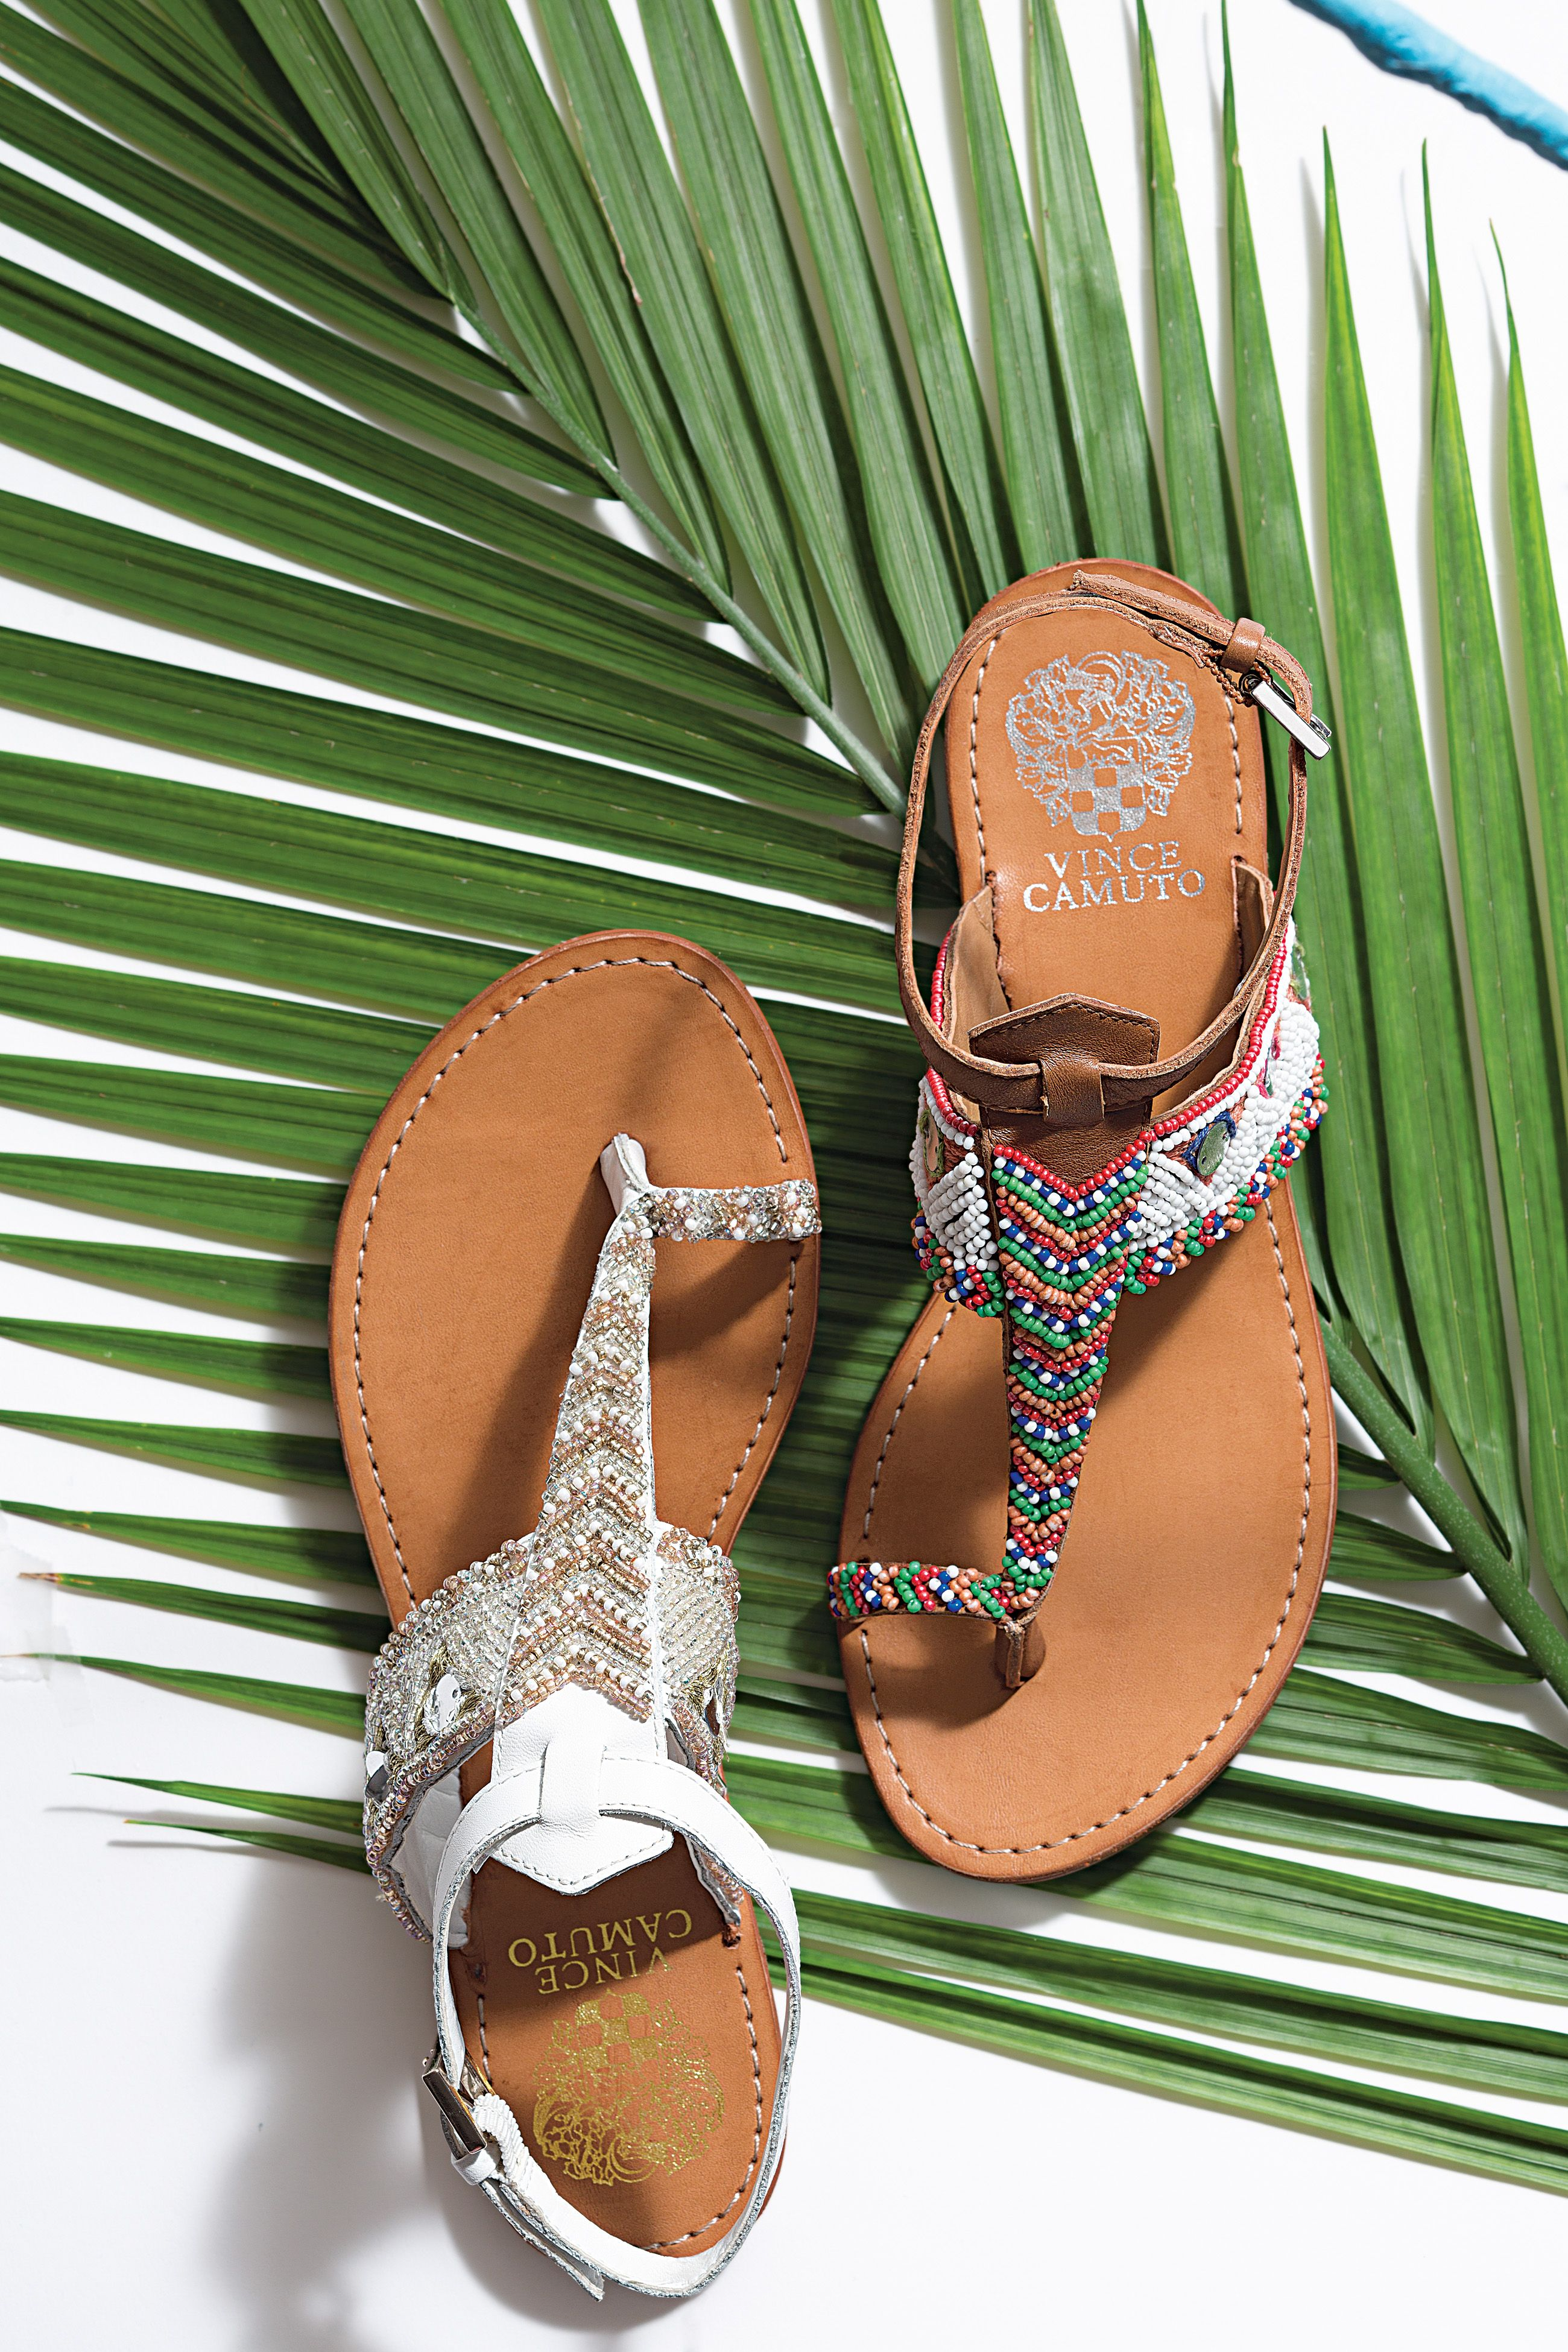 Best 25 Sandals On Sale Ideas On Pinterest Sandals Sale Shoes On Sale And Womens Sandals On Sale